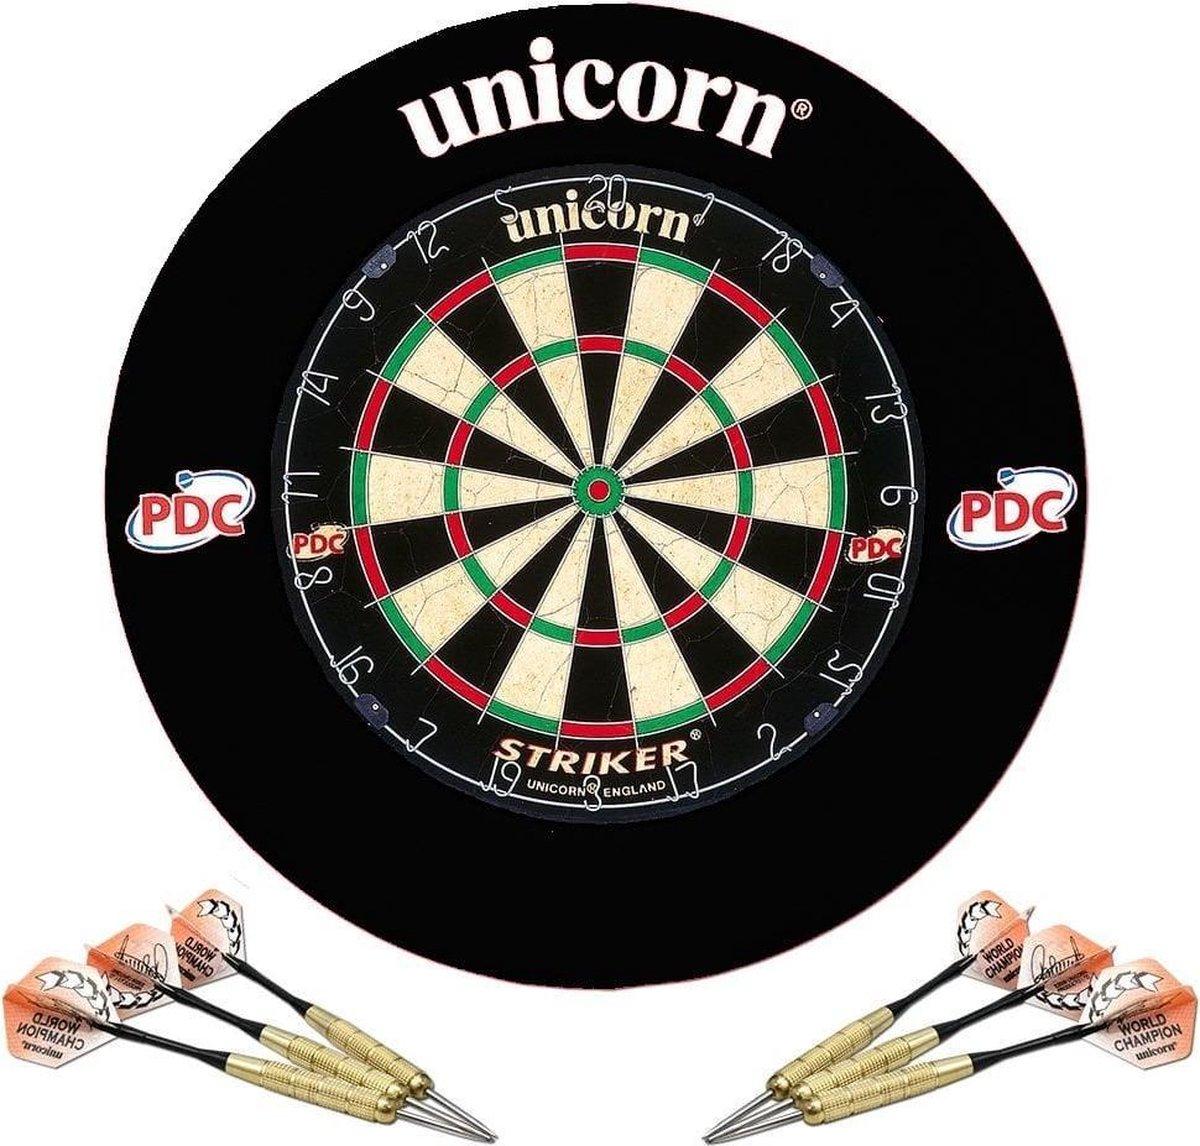 Unicorn - Striker Home Dartset - Dartbord met Beschermring en 2 sets Dartpijlen - Zwart